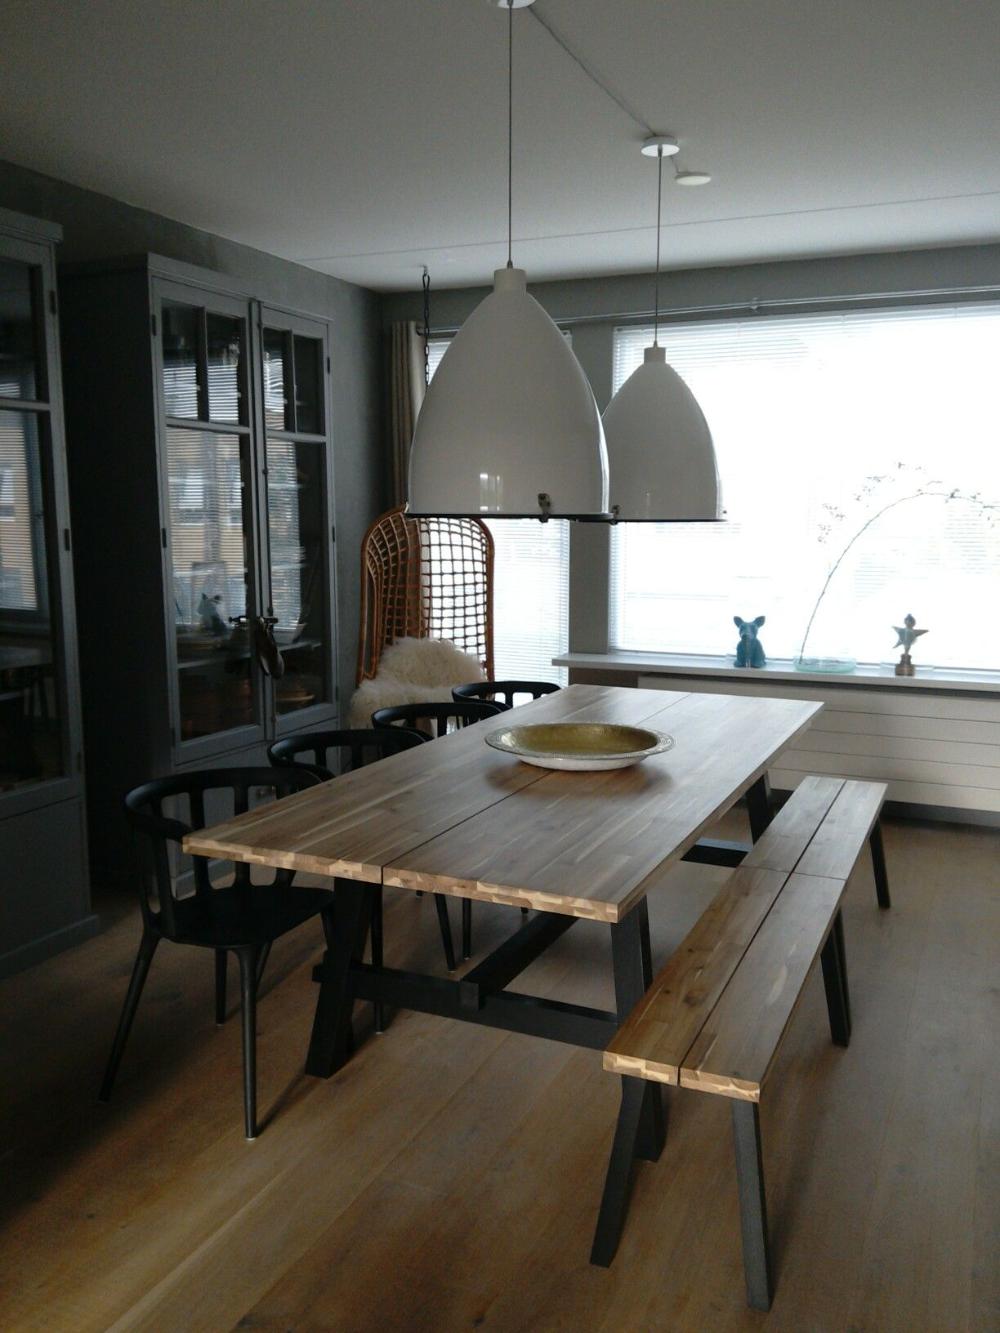 Skogsta Dining Table Google Search Ikea Dining Room Ikea Dining Dining Table With Bench